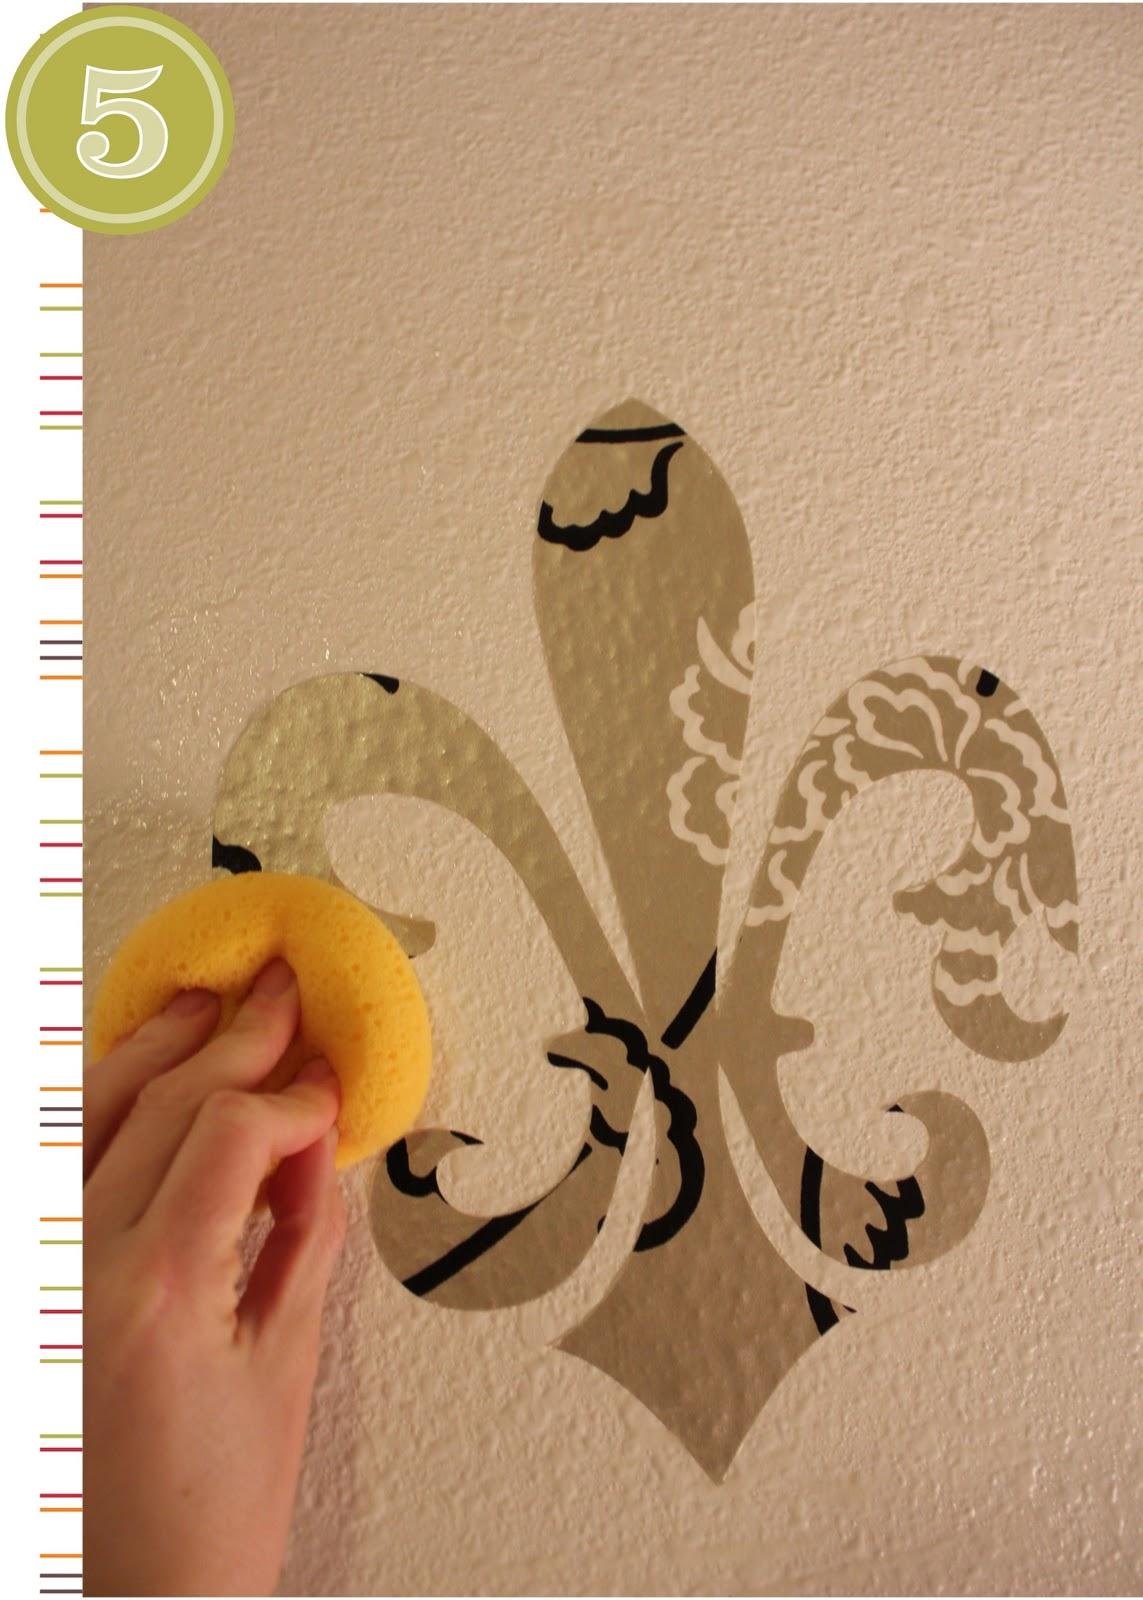 http://4.bp.blogspot.com/-HxyyhvvfmiM/TxiIbfAzZ6I/AAAAAAAABXs/7whWJmizCKM/s1600/DIY+Wall+Decals-008.jpg